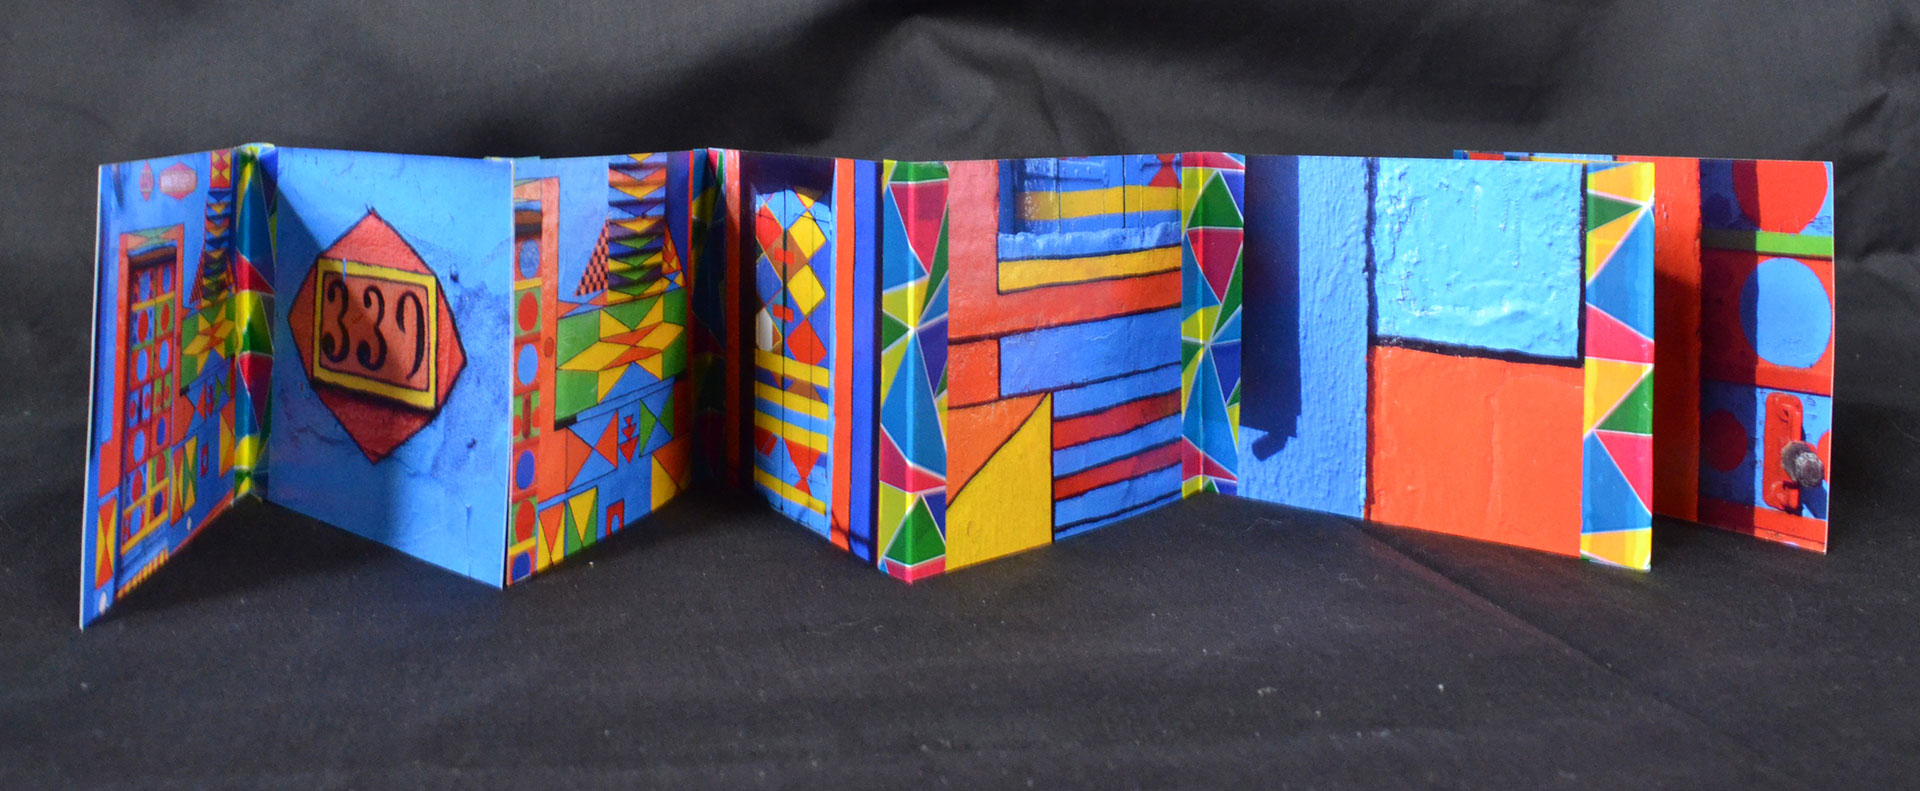 D. Cichon, Bepi\'s House - Burano Italy, Original photos and washi tape, 2016, $25, Mountain View, CA